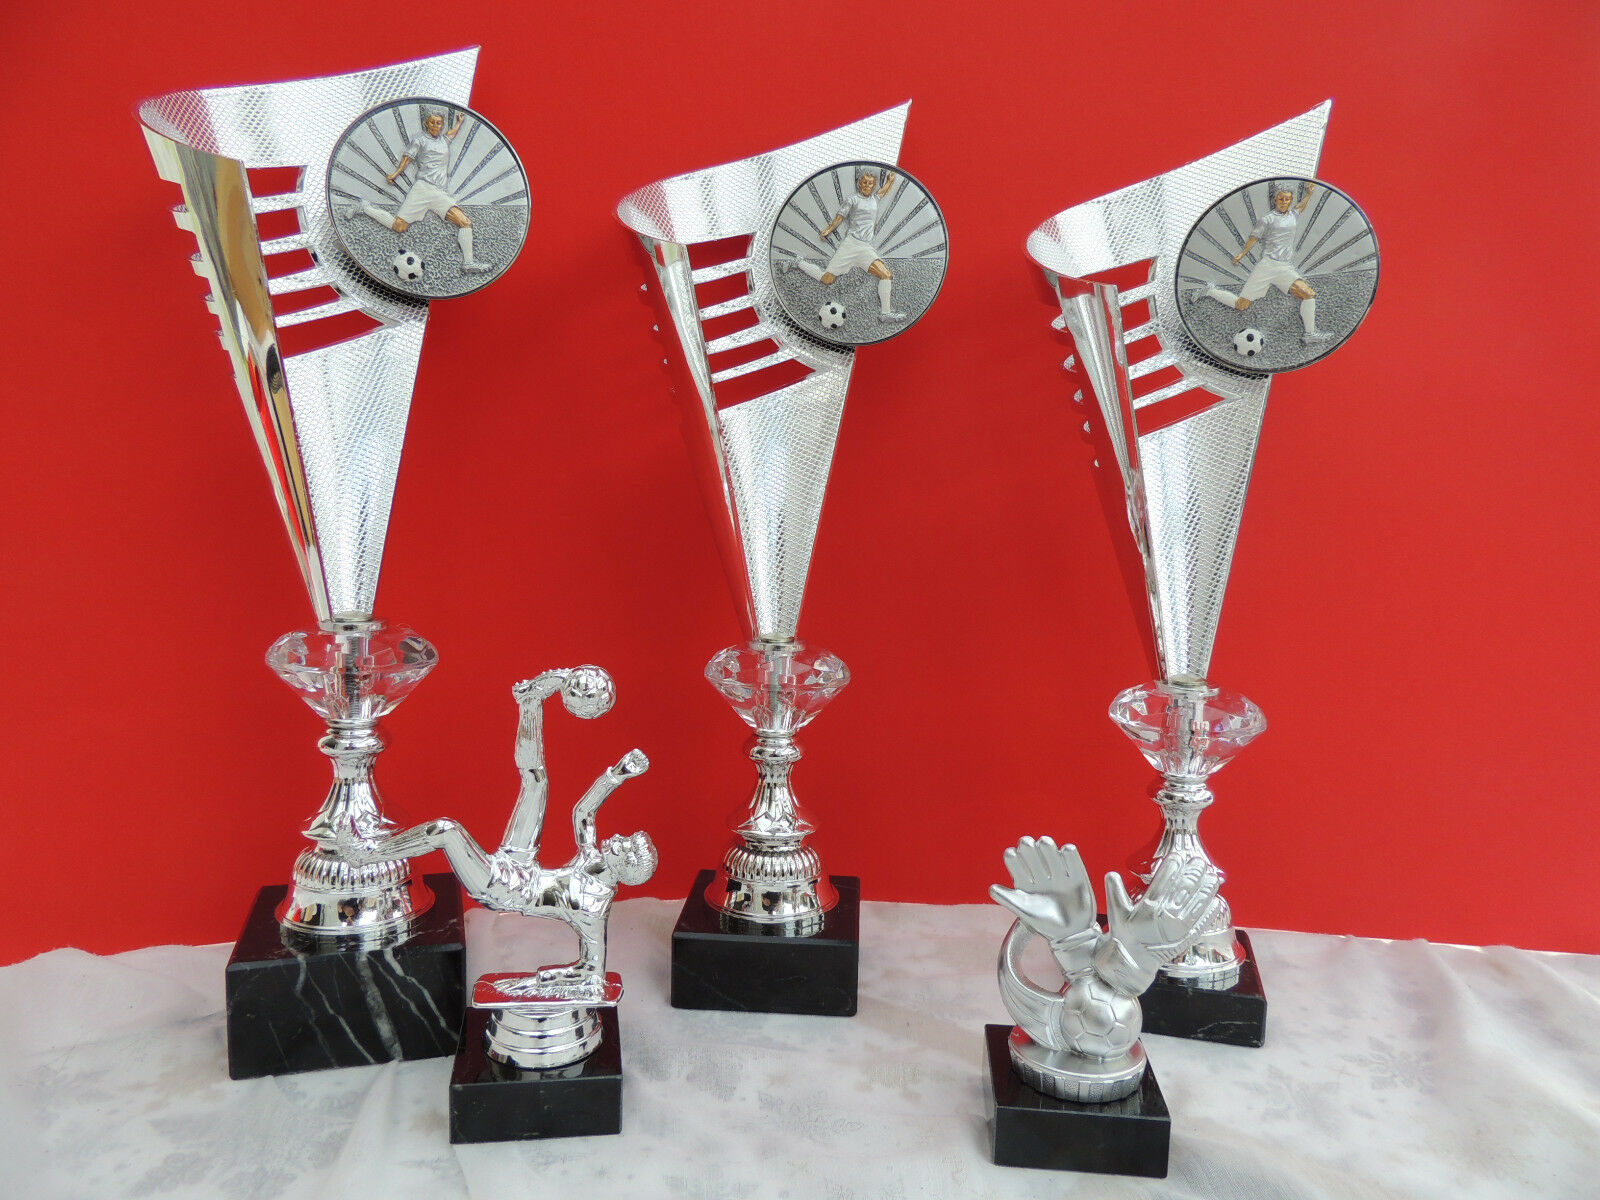 Pokale Pokal Set Dart Fußball 5 5 5 tlg Gold o.silber NEU 2018 mit Gravur & 3DEmblem 9e82f0